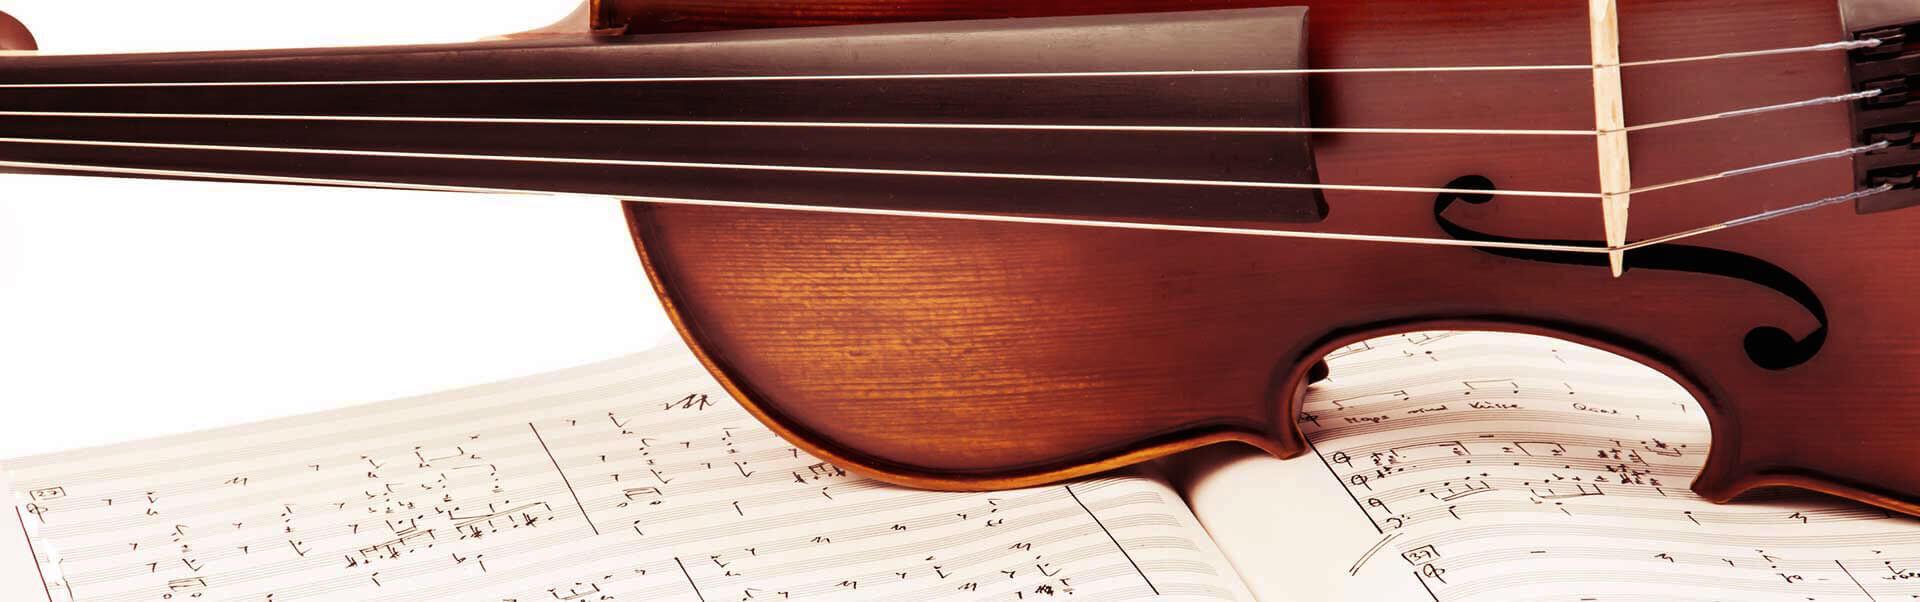 Musikschule Header Bild